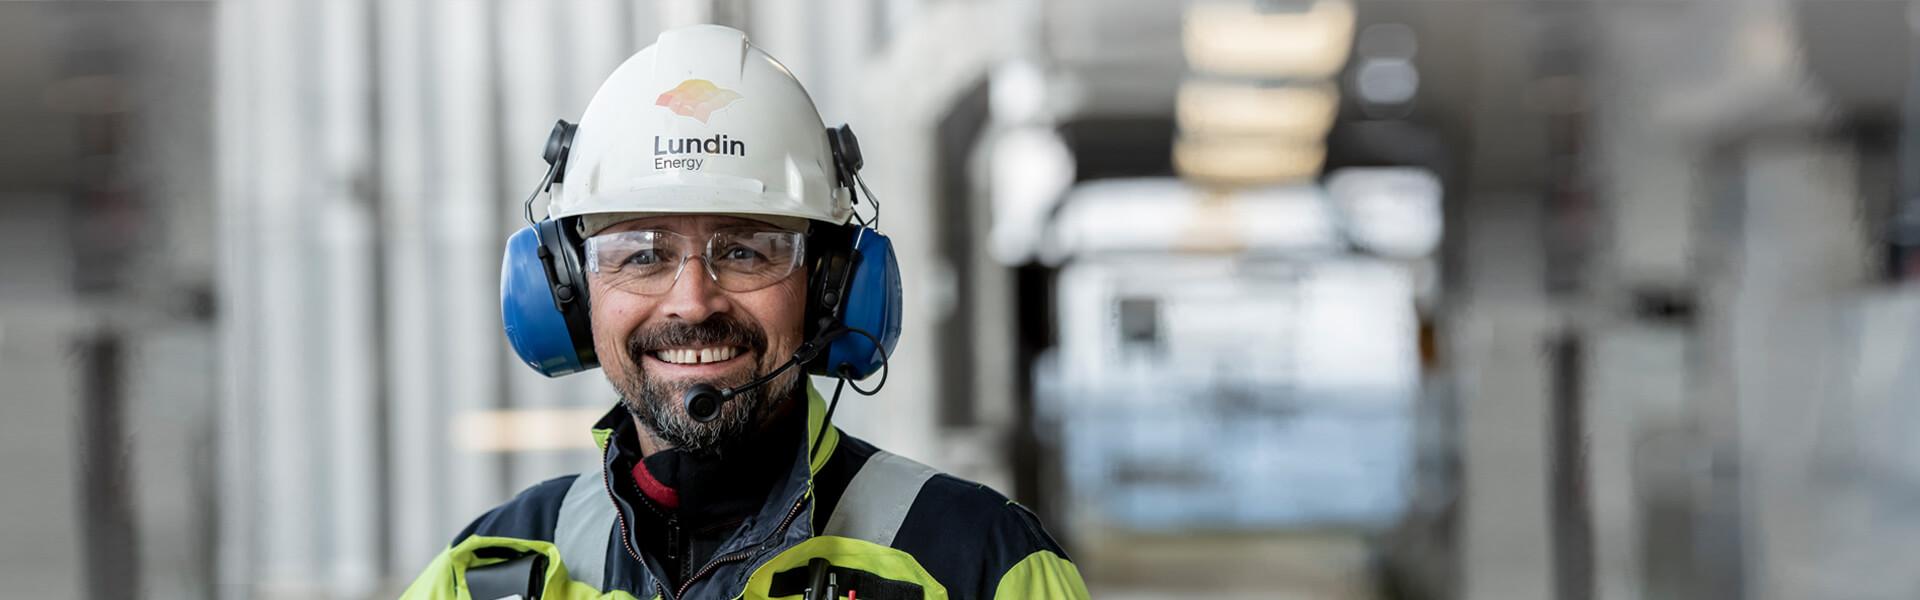 Lundin Energy - Operations Edvard Grieg